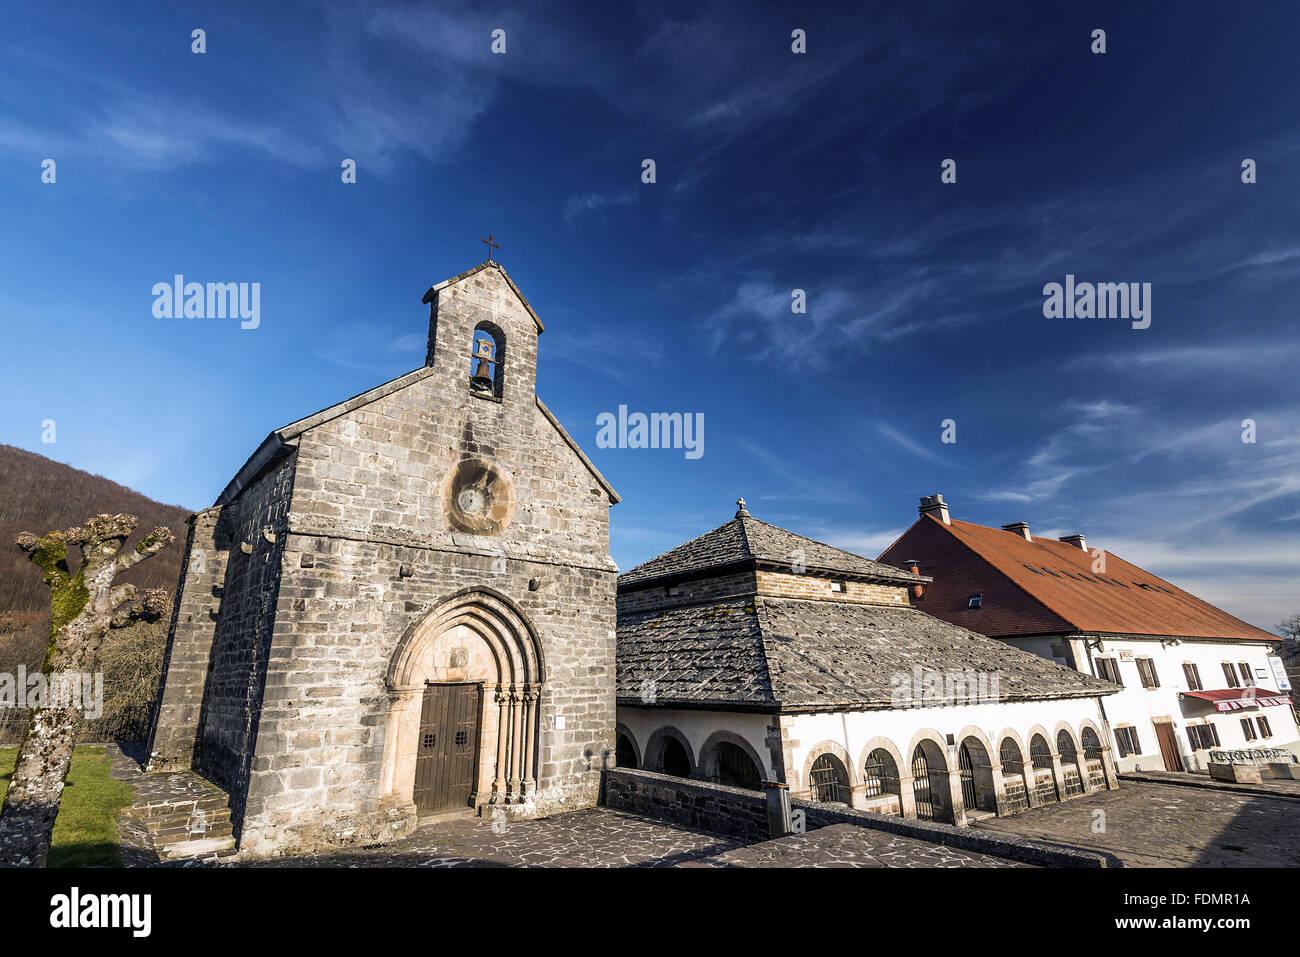 Church of Santiago de Los Pilgrims on the French Route of the Camino de Santiago de Compostela - Stock Image